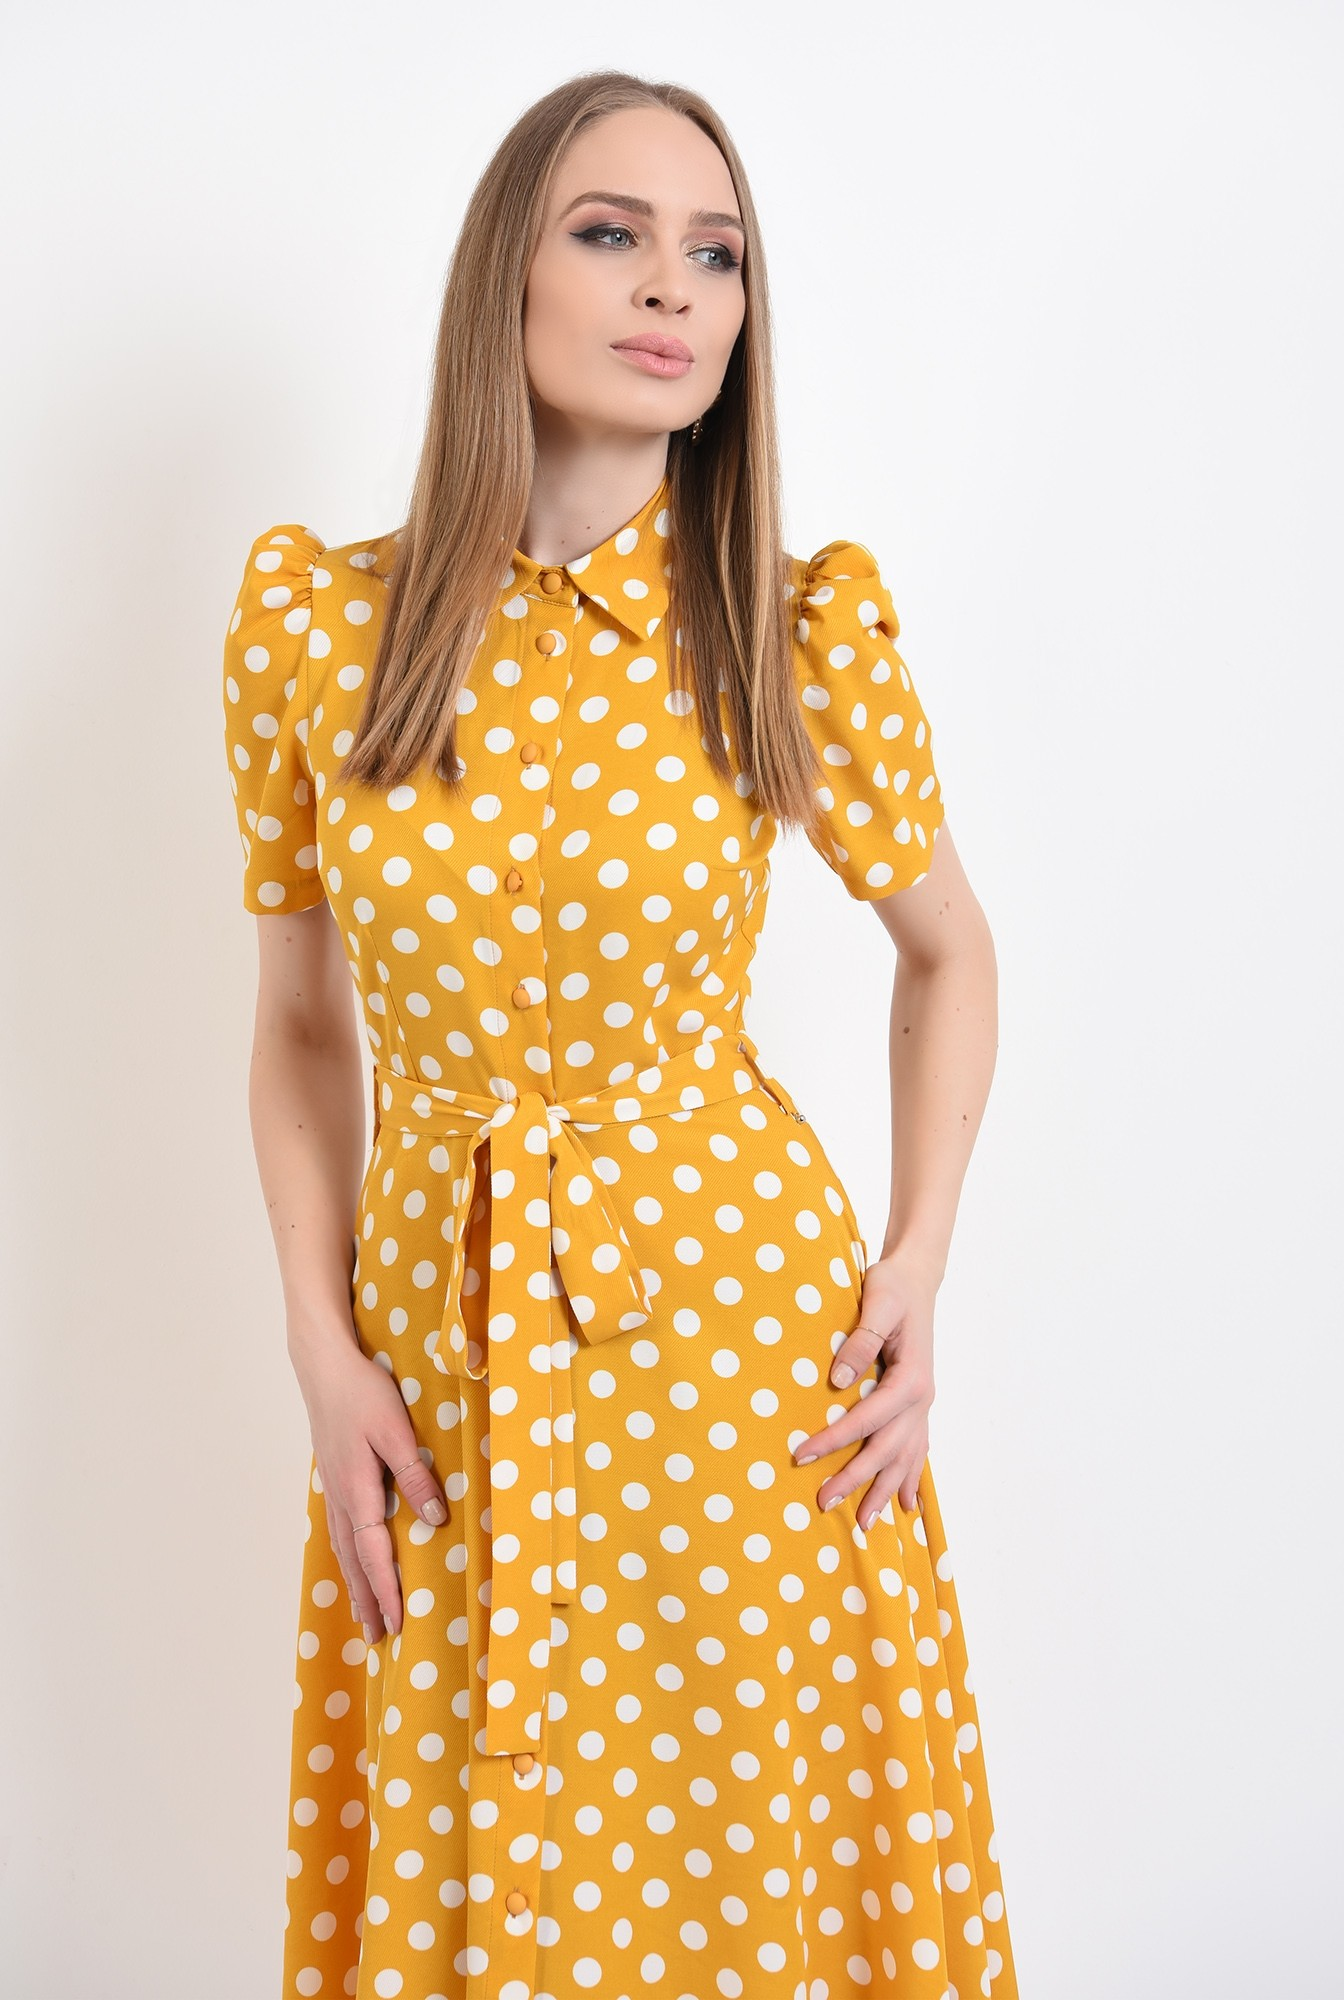 2 - 360 - rochie casual, evazata, cu nasturi, cu cordon, buline, Poema